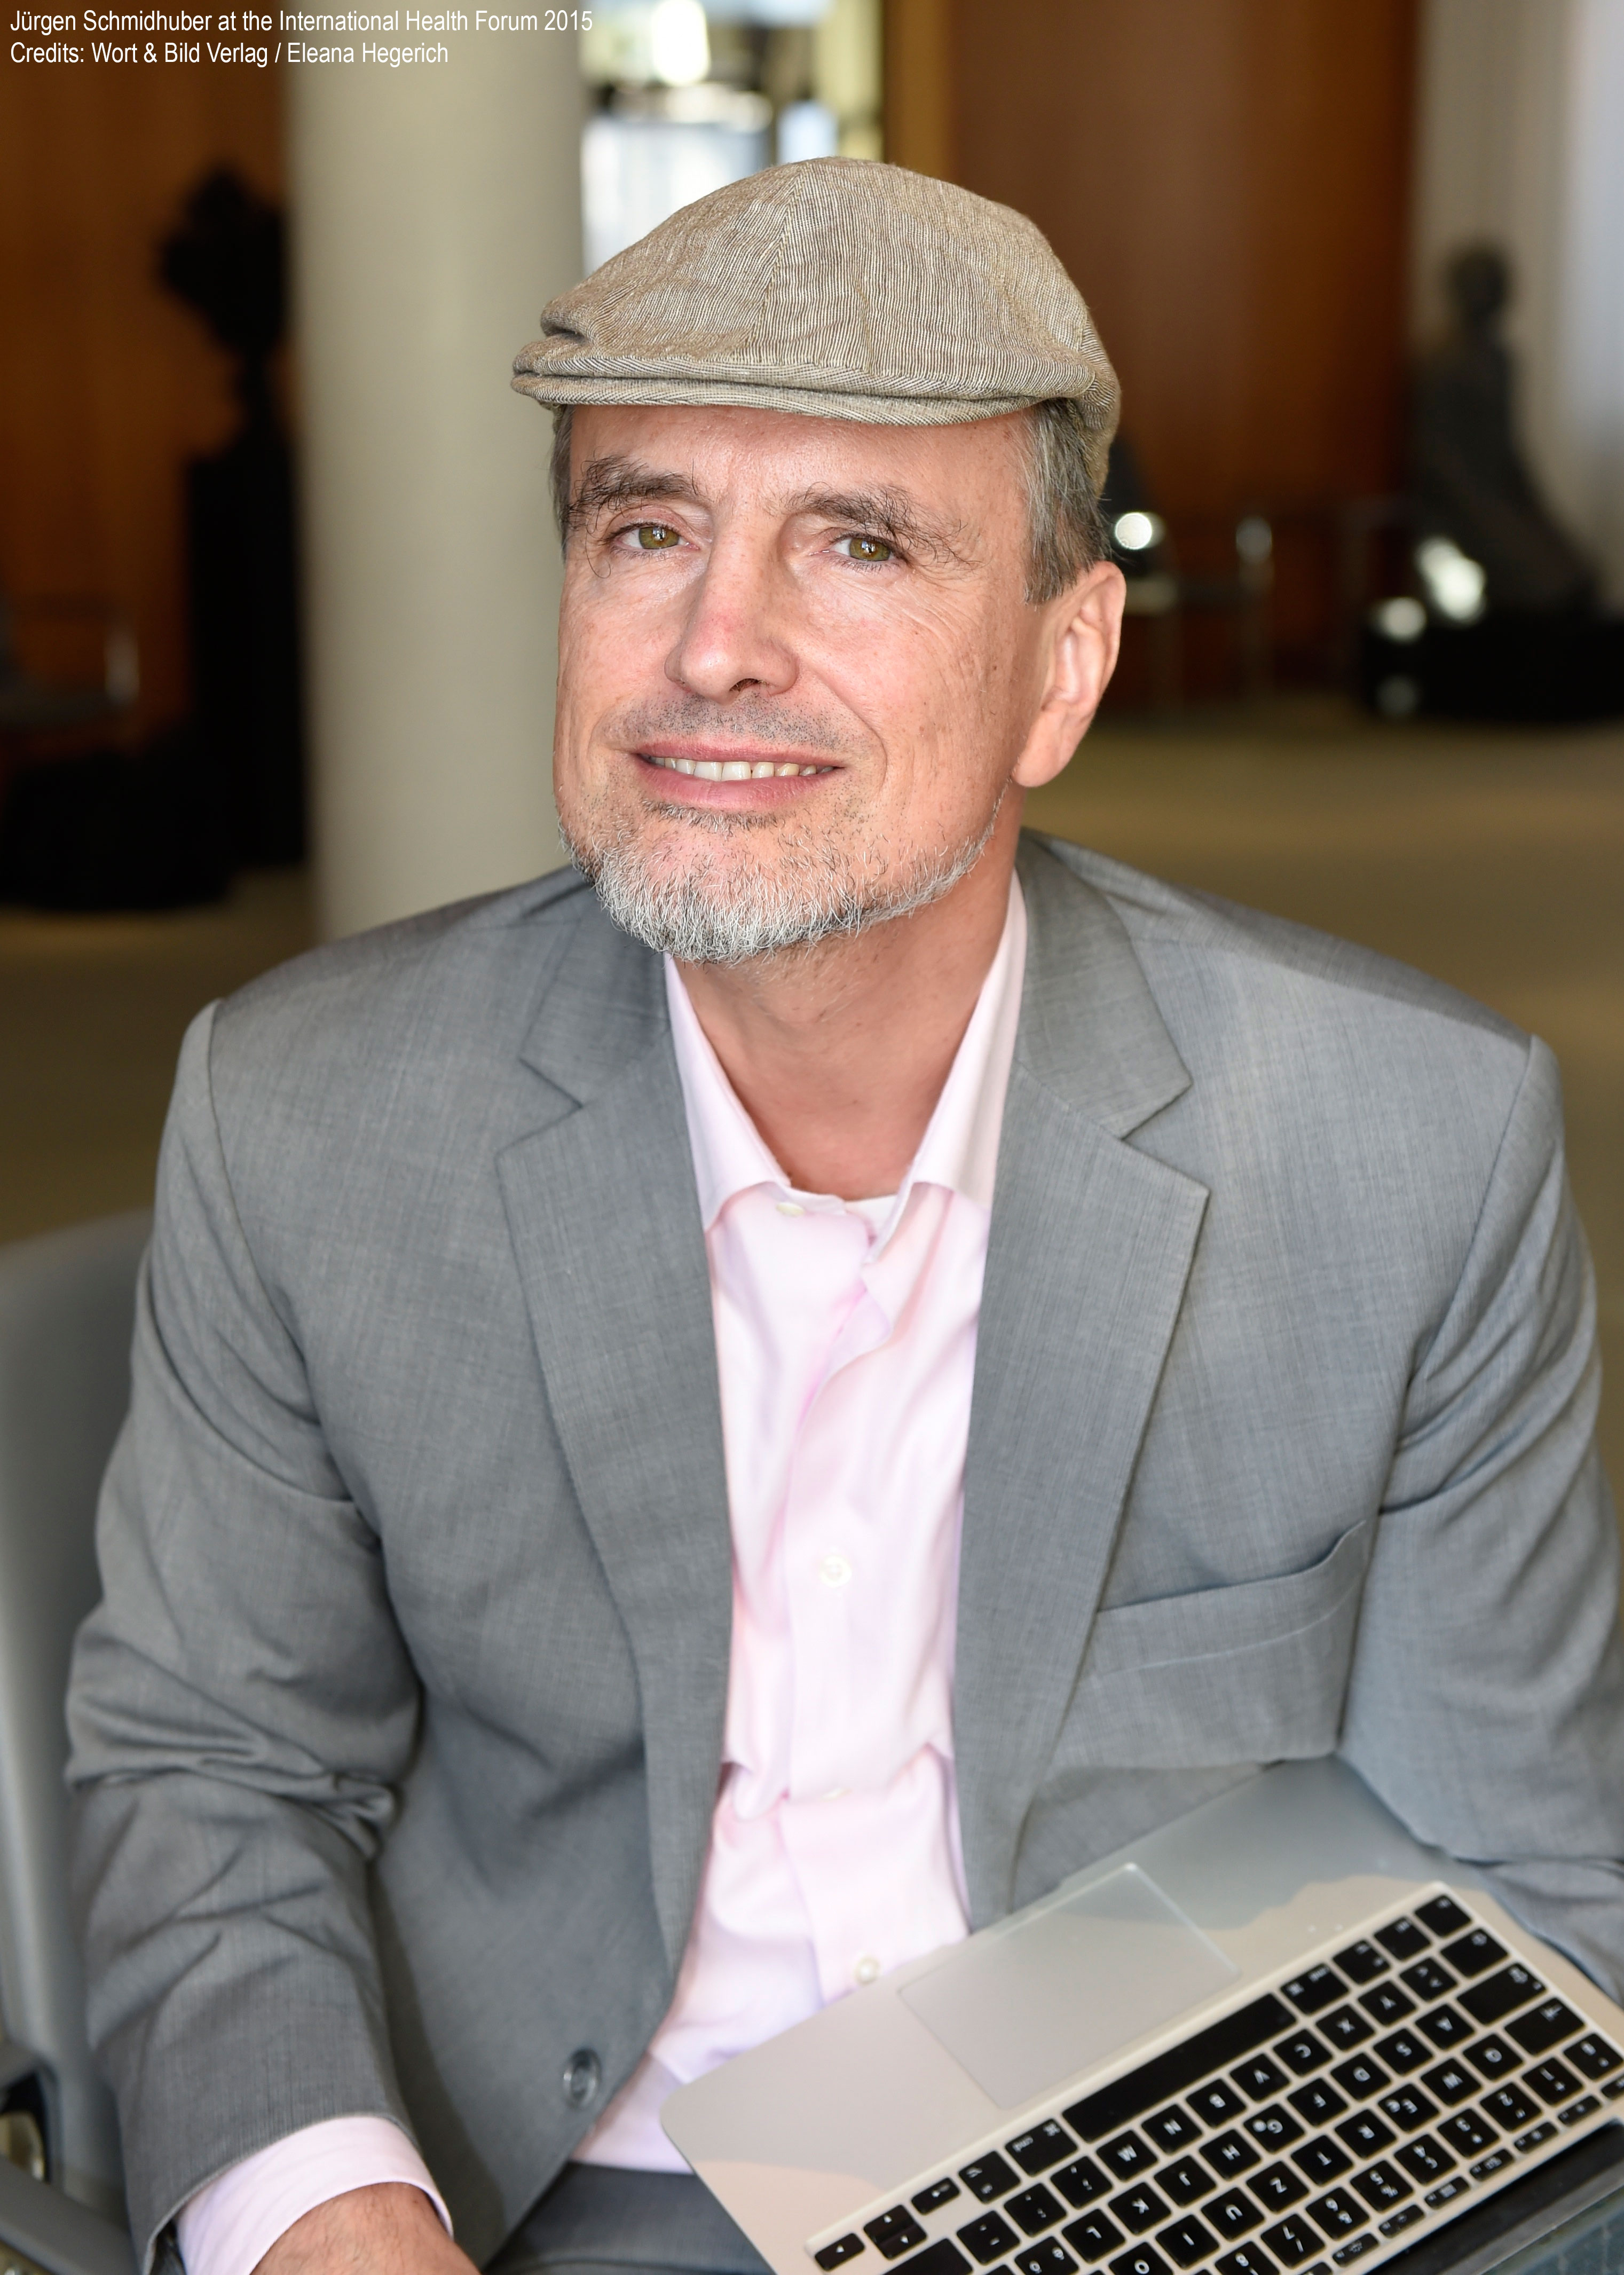 Prof. Dr. Schmidhuber